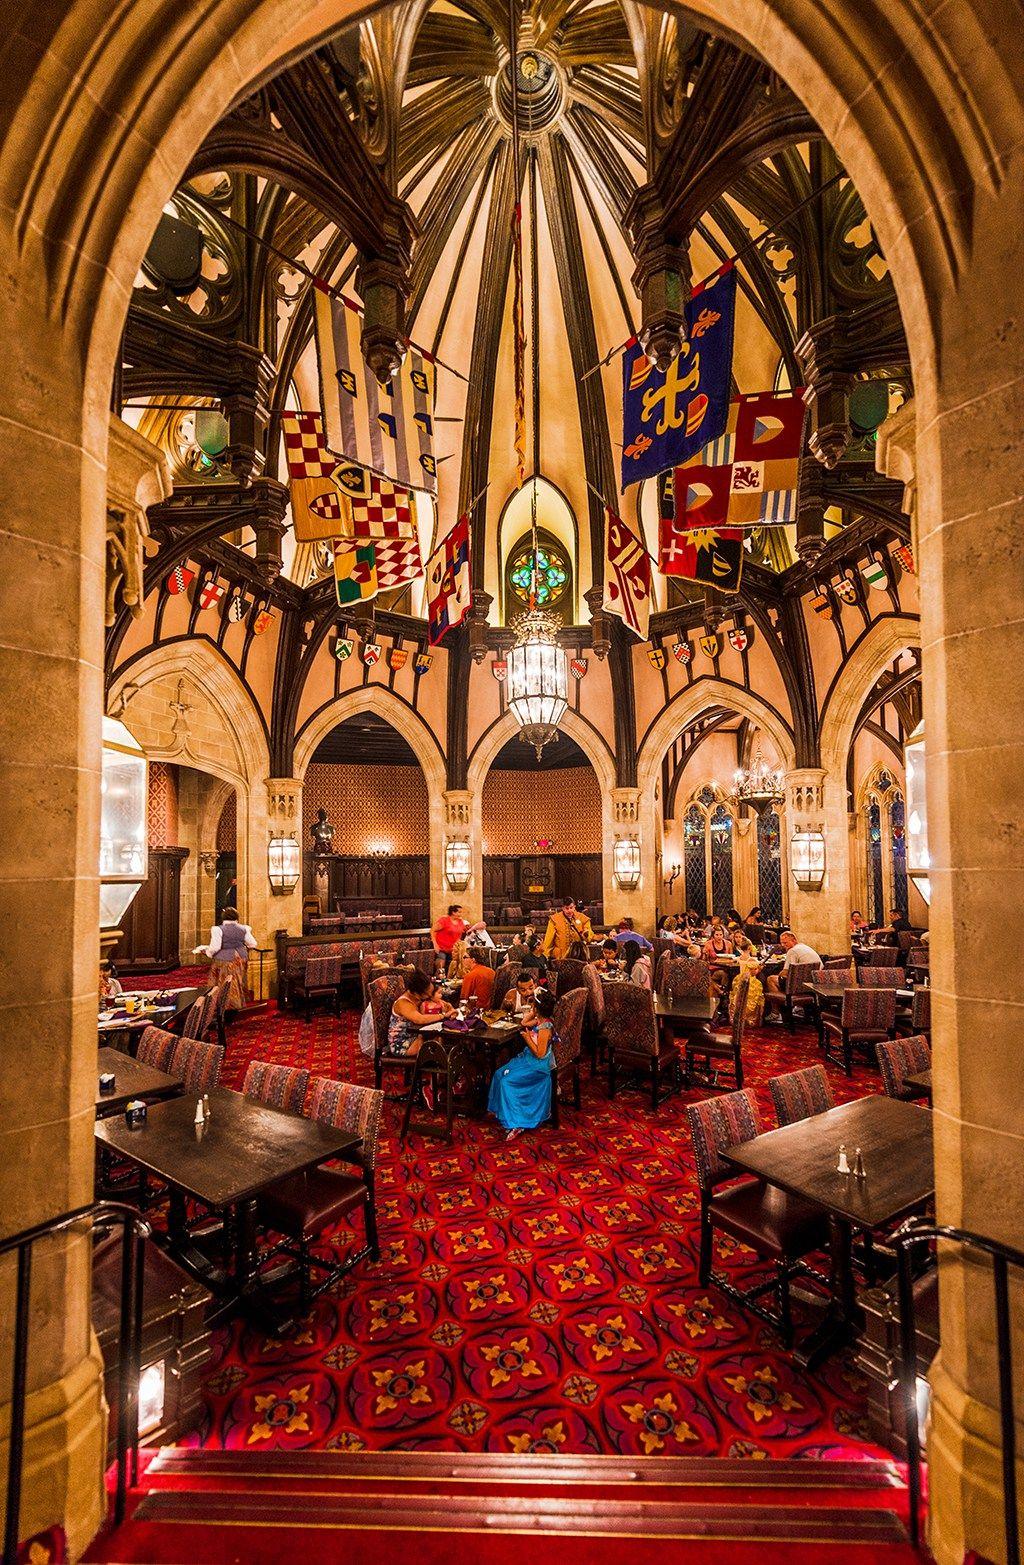 cinderella s royal table review january trip disney world rh pinterest com